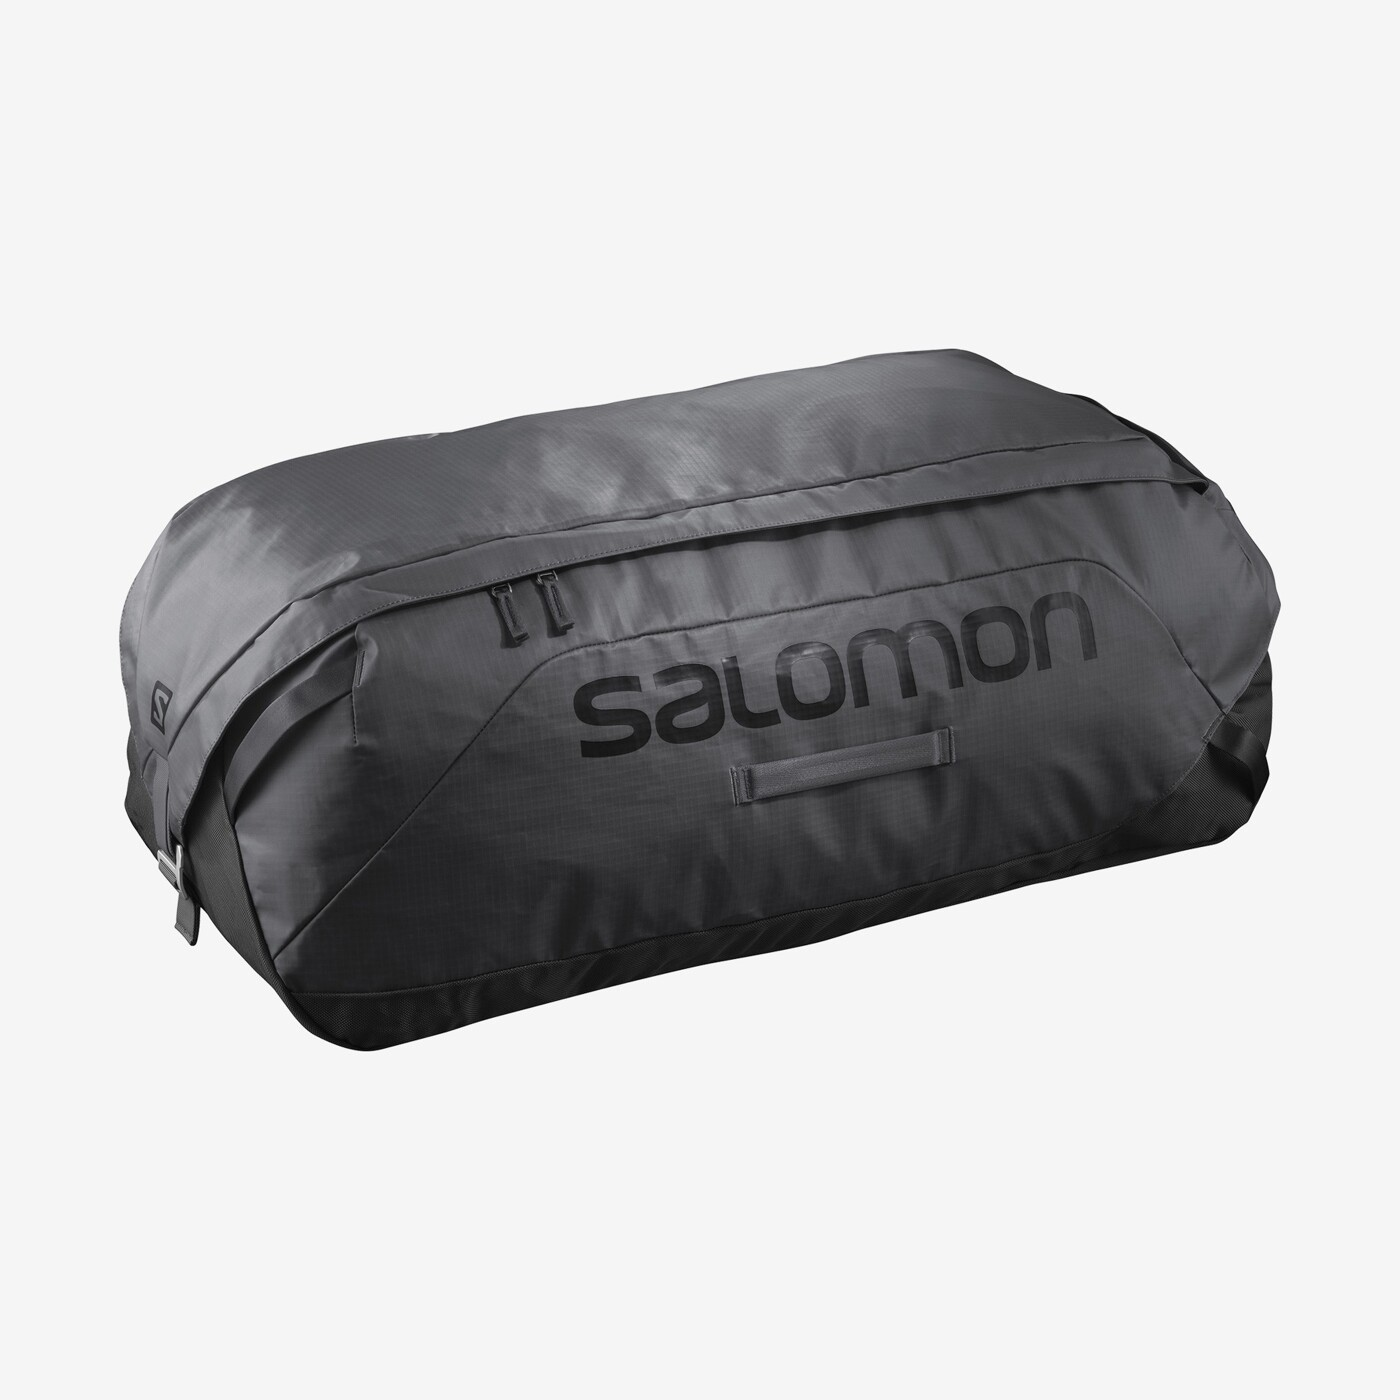 SALOMON OUTLIFE DUFFEL 100 Unisex - Reisetasche